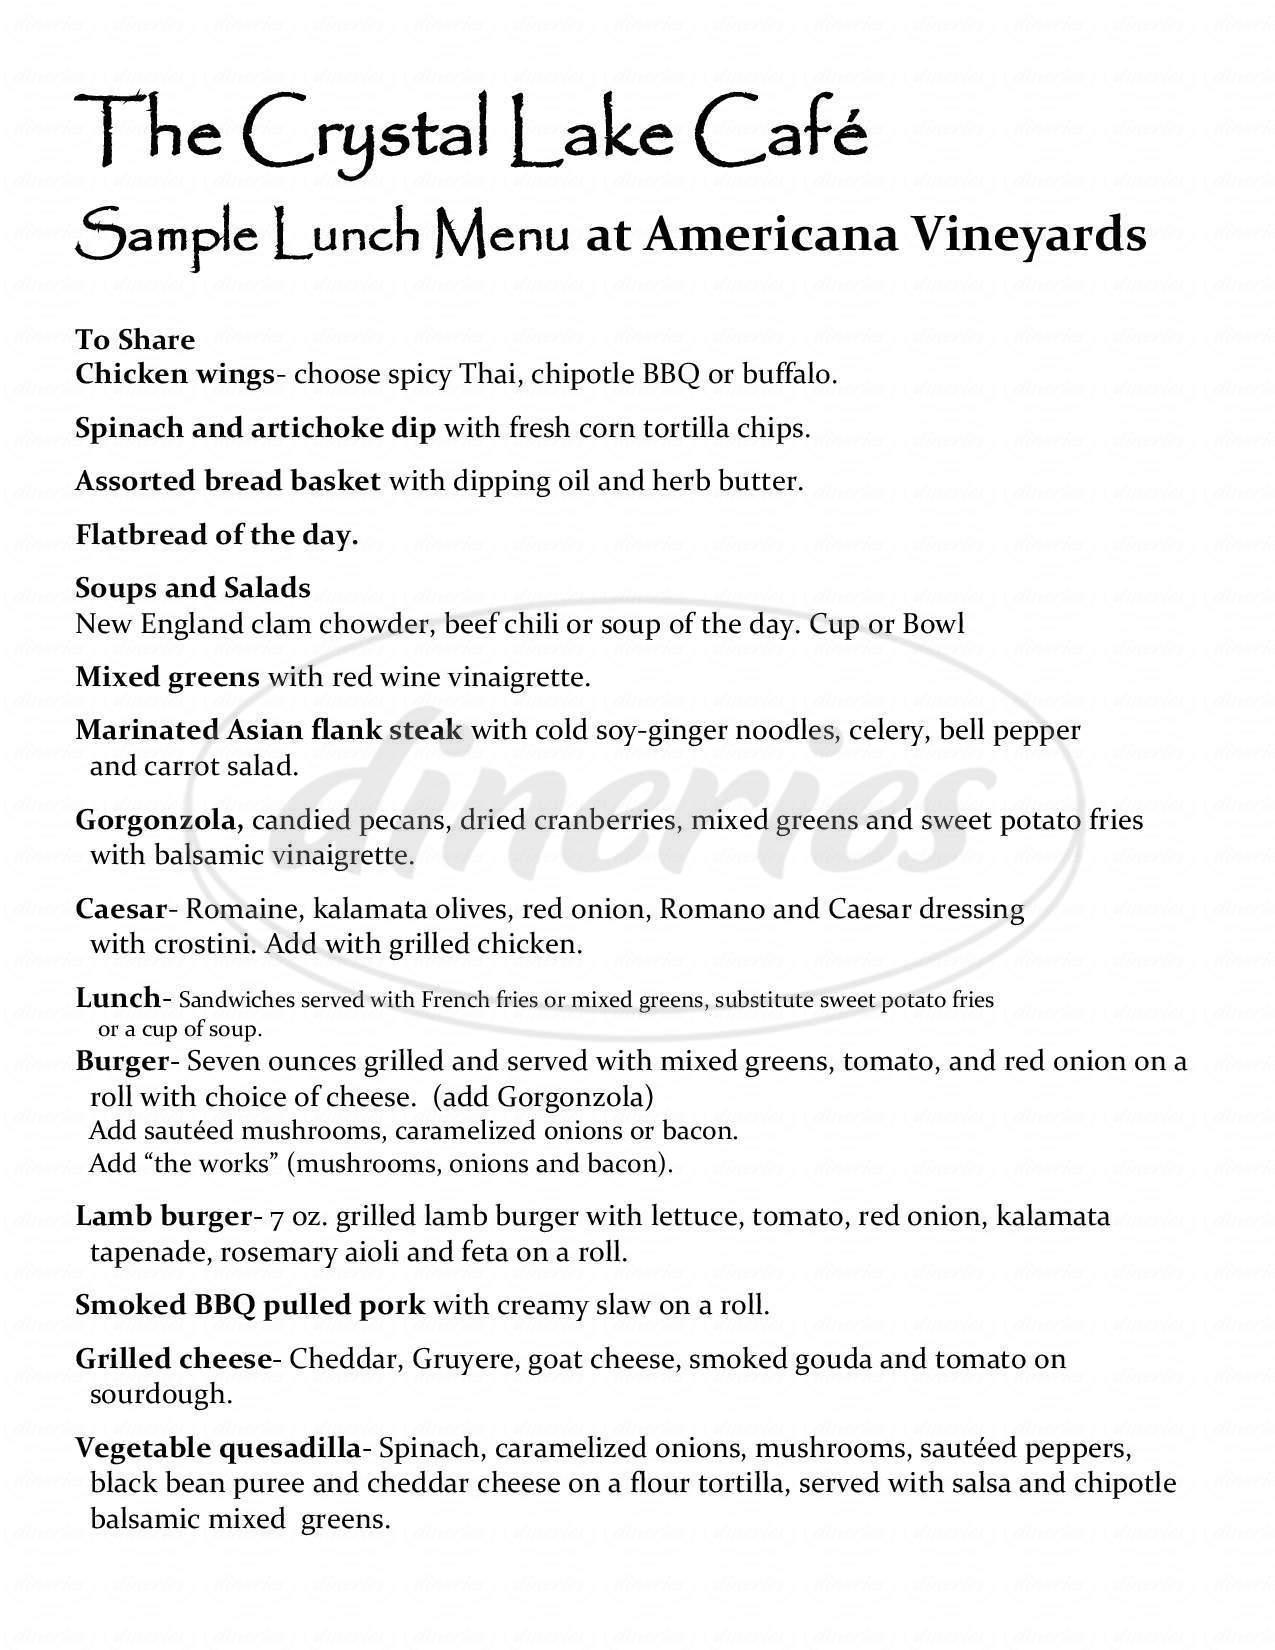 menu for Crystal Lake Cafe